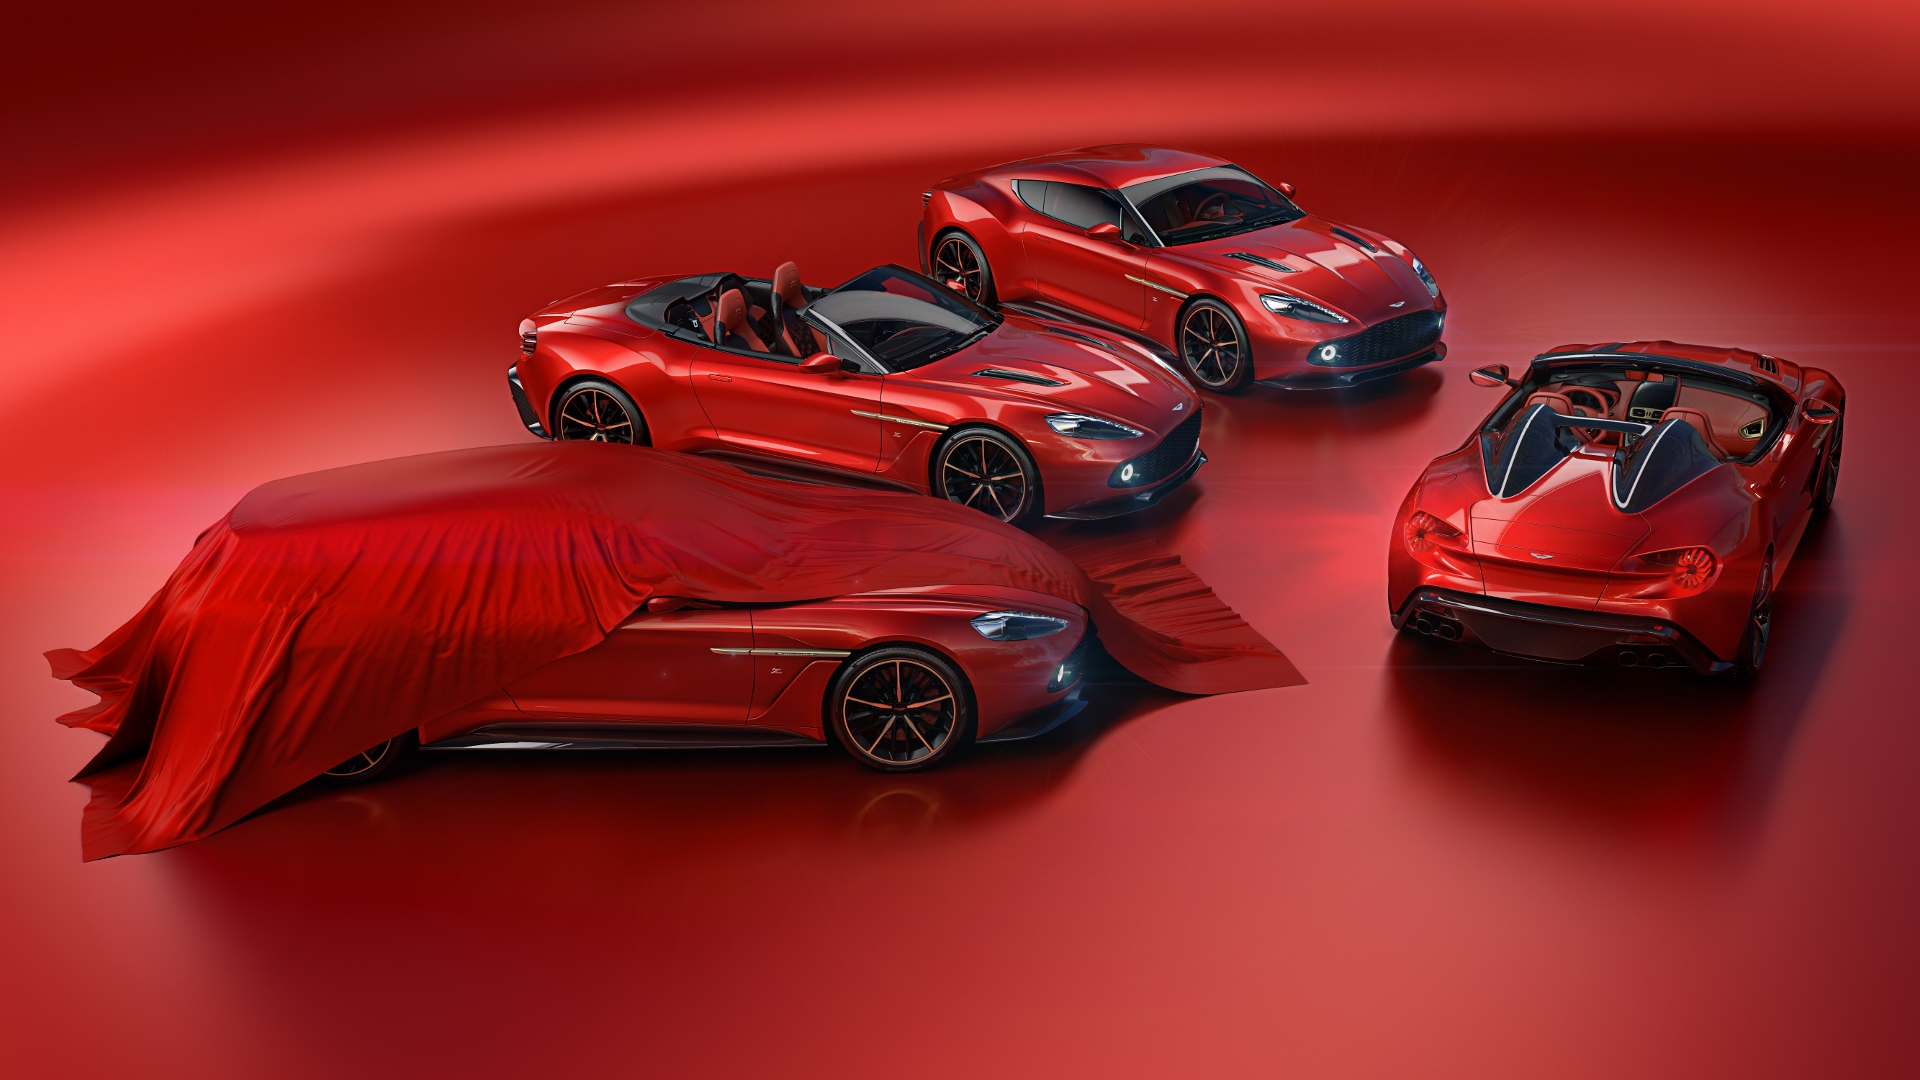 Aston Martin Vanquish Zagato Shooting Brake Is A Hot Hatch We Dig